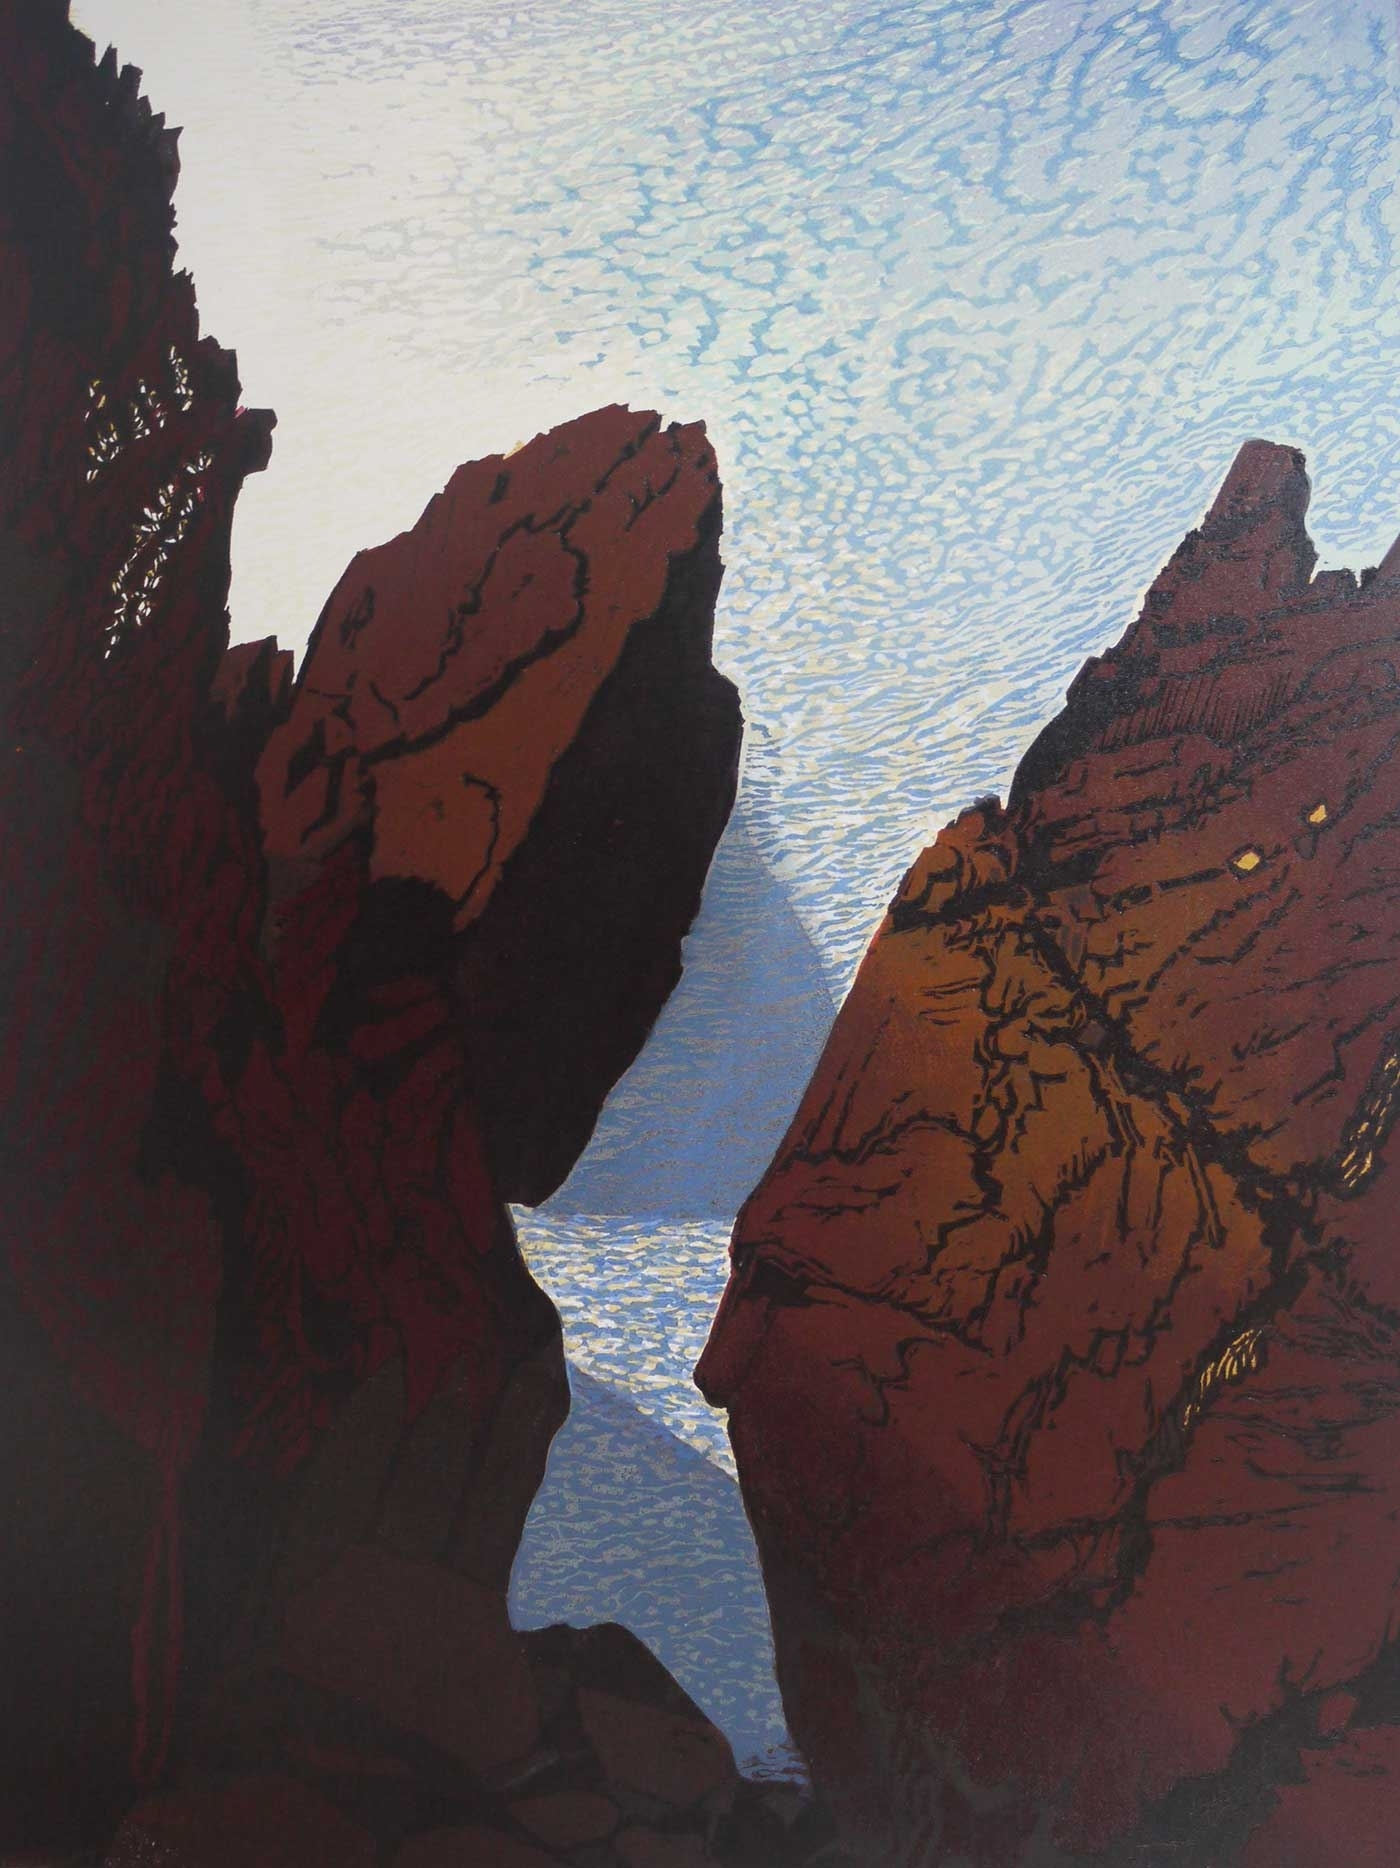 Twinletts, Woodcut, 60 cm x 45 cm